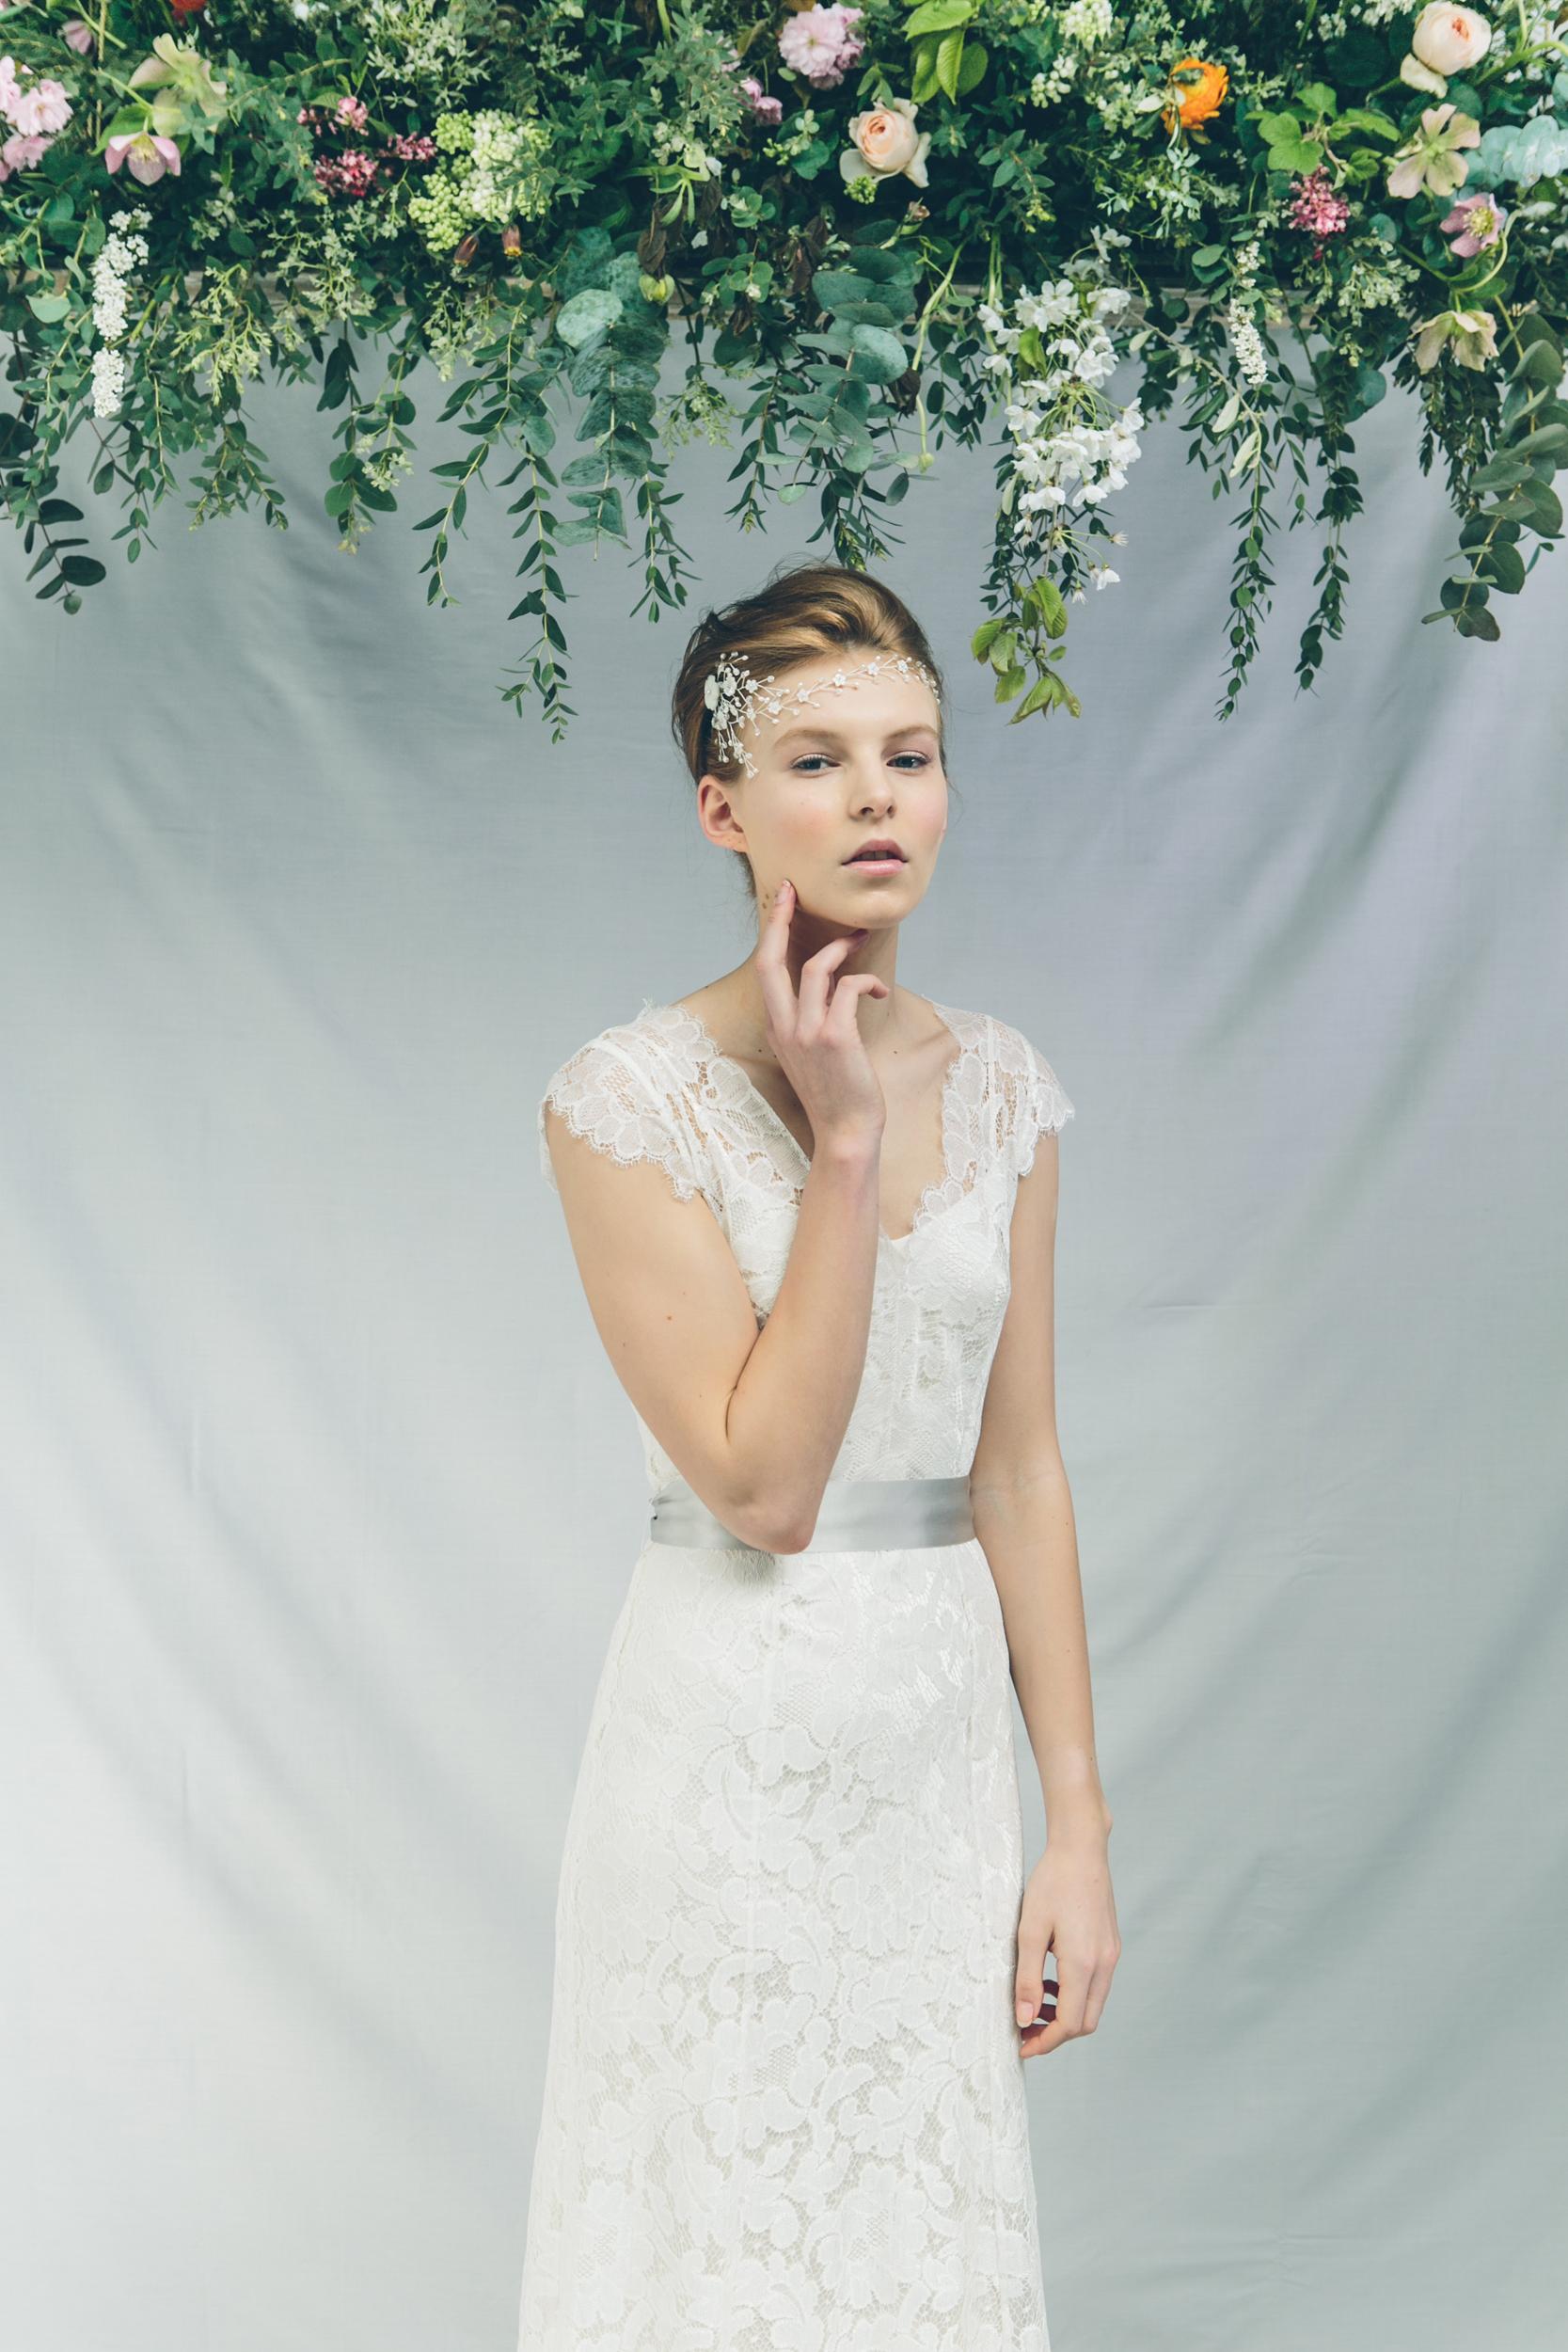 Kate-Beaumont-Wedding-Dresses-Sheffield-46.jpg